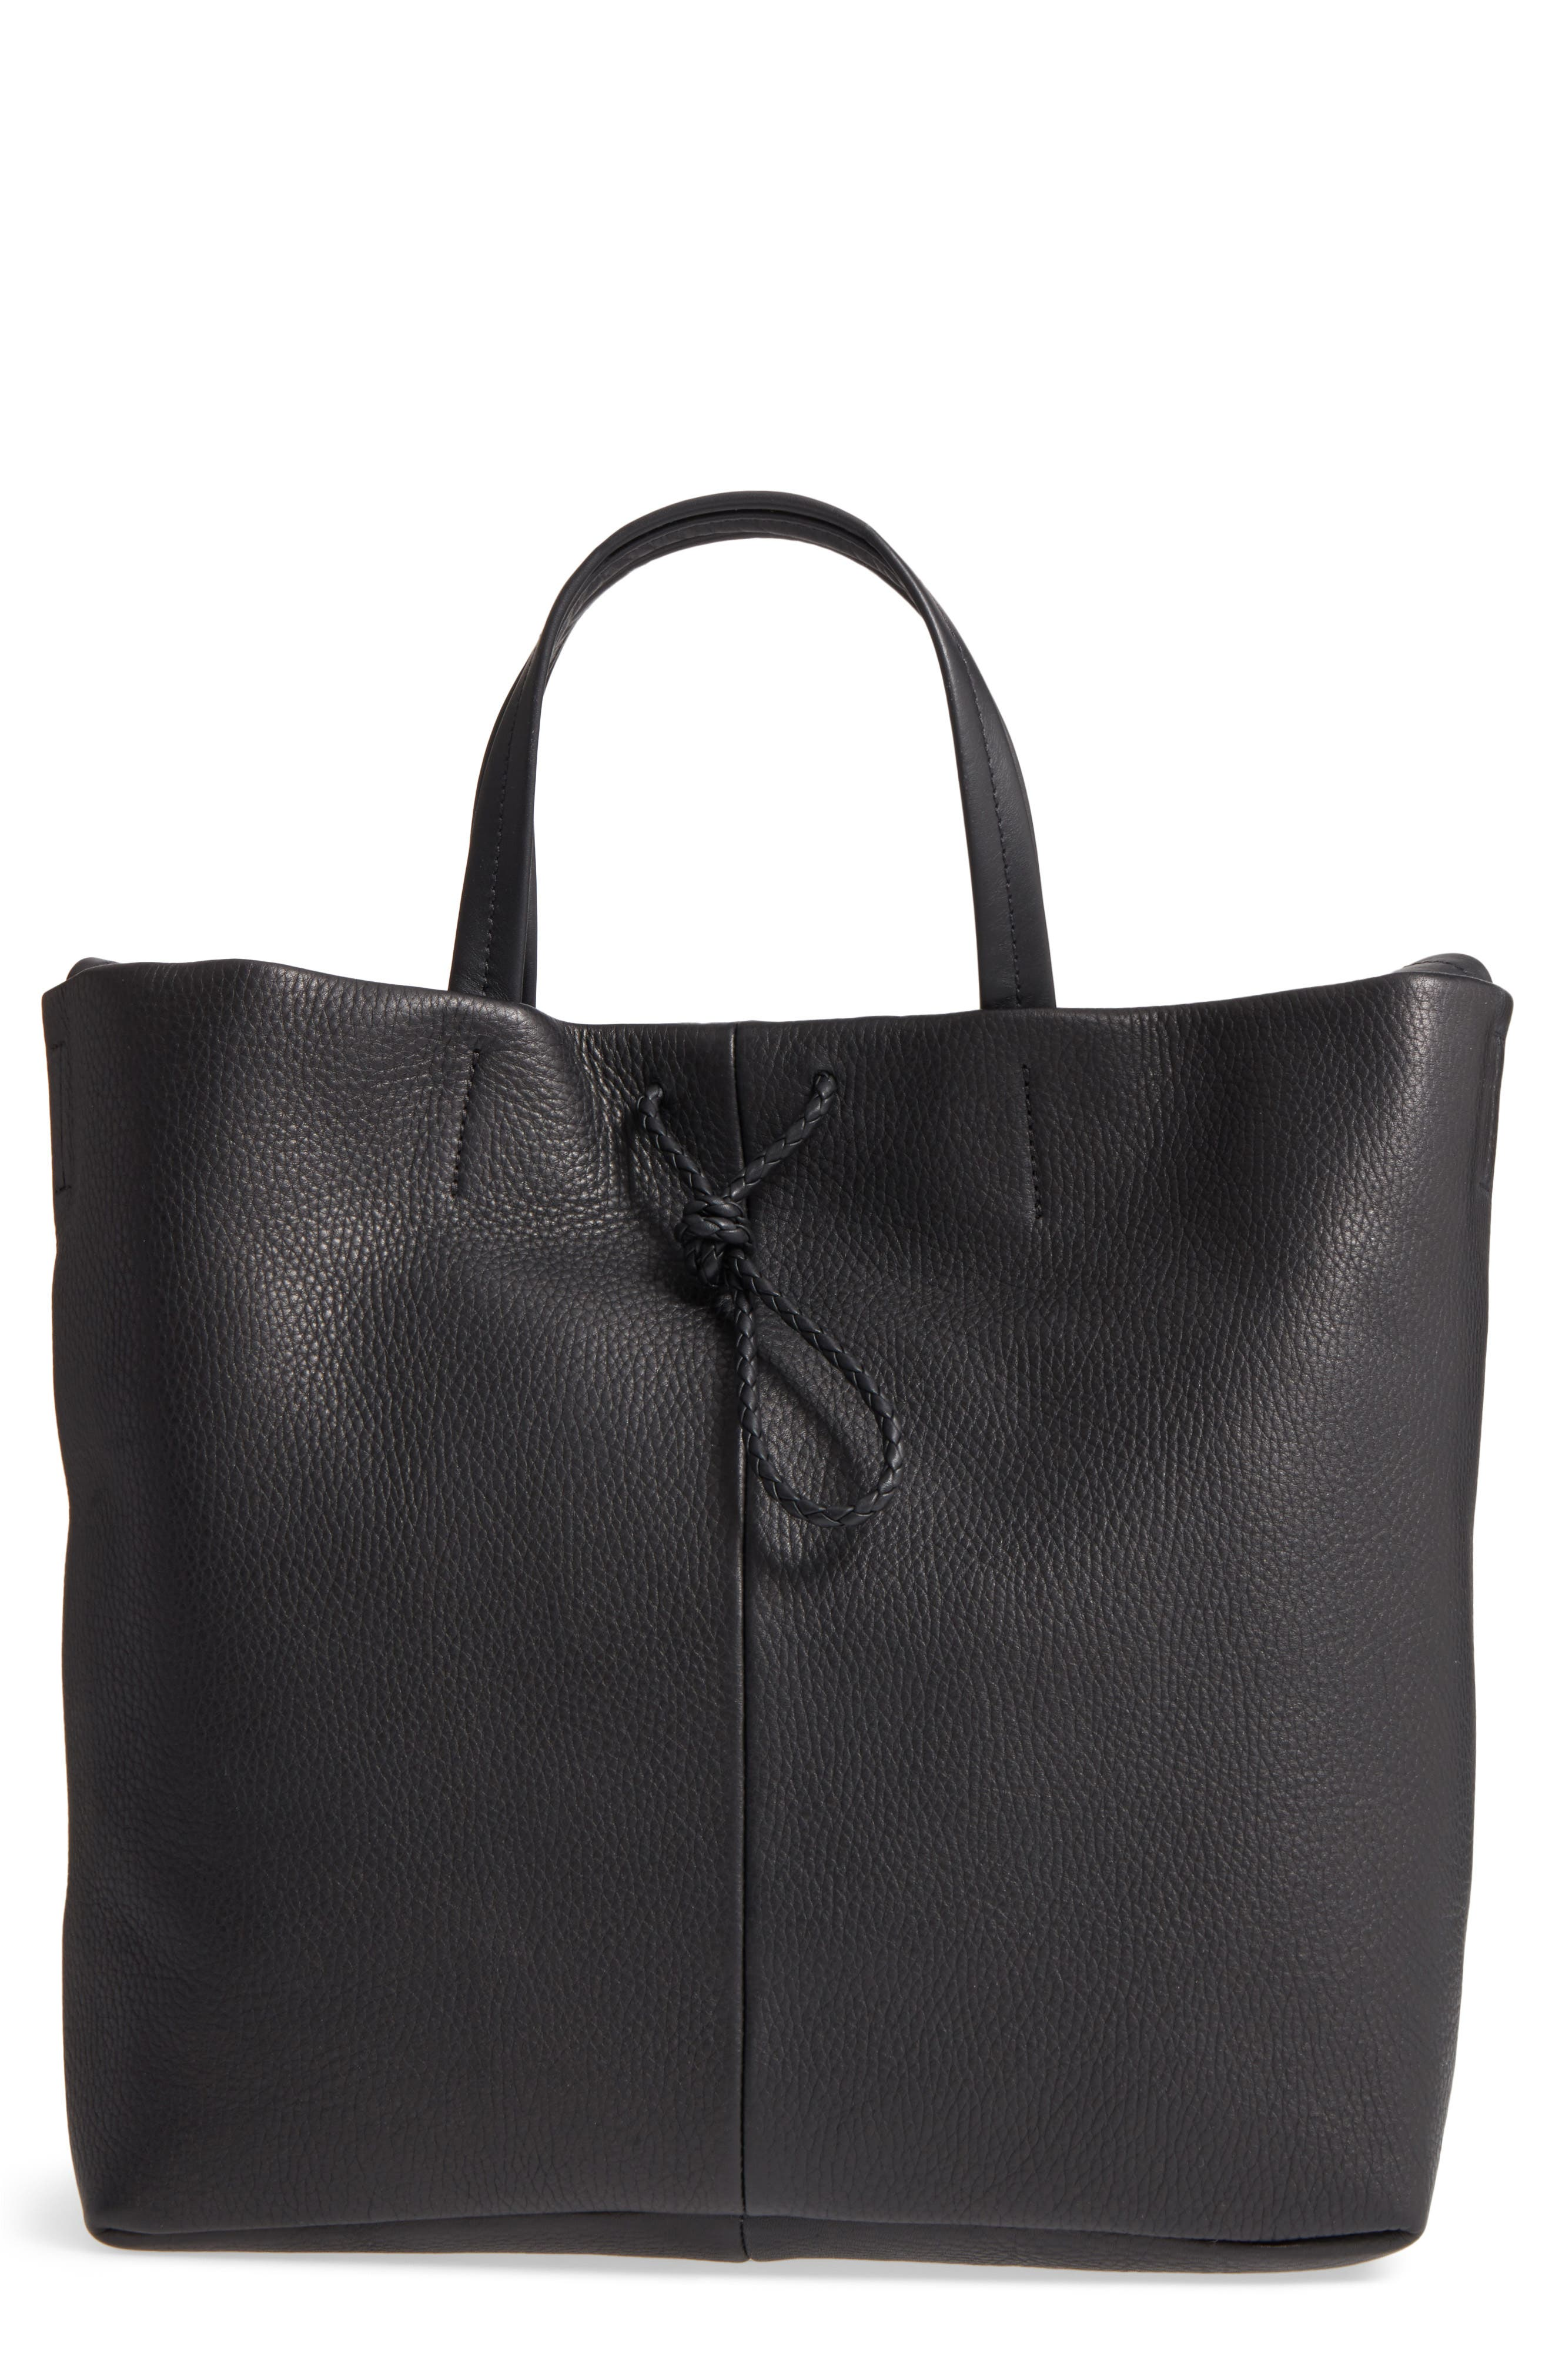 Latigo Square Pebbled Leather Shopper Tote,                         Main,                         color, 001